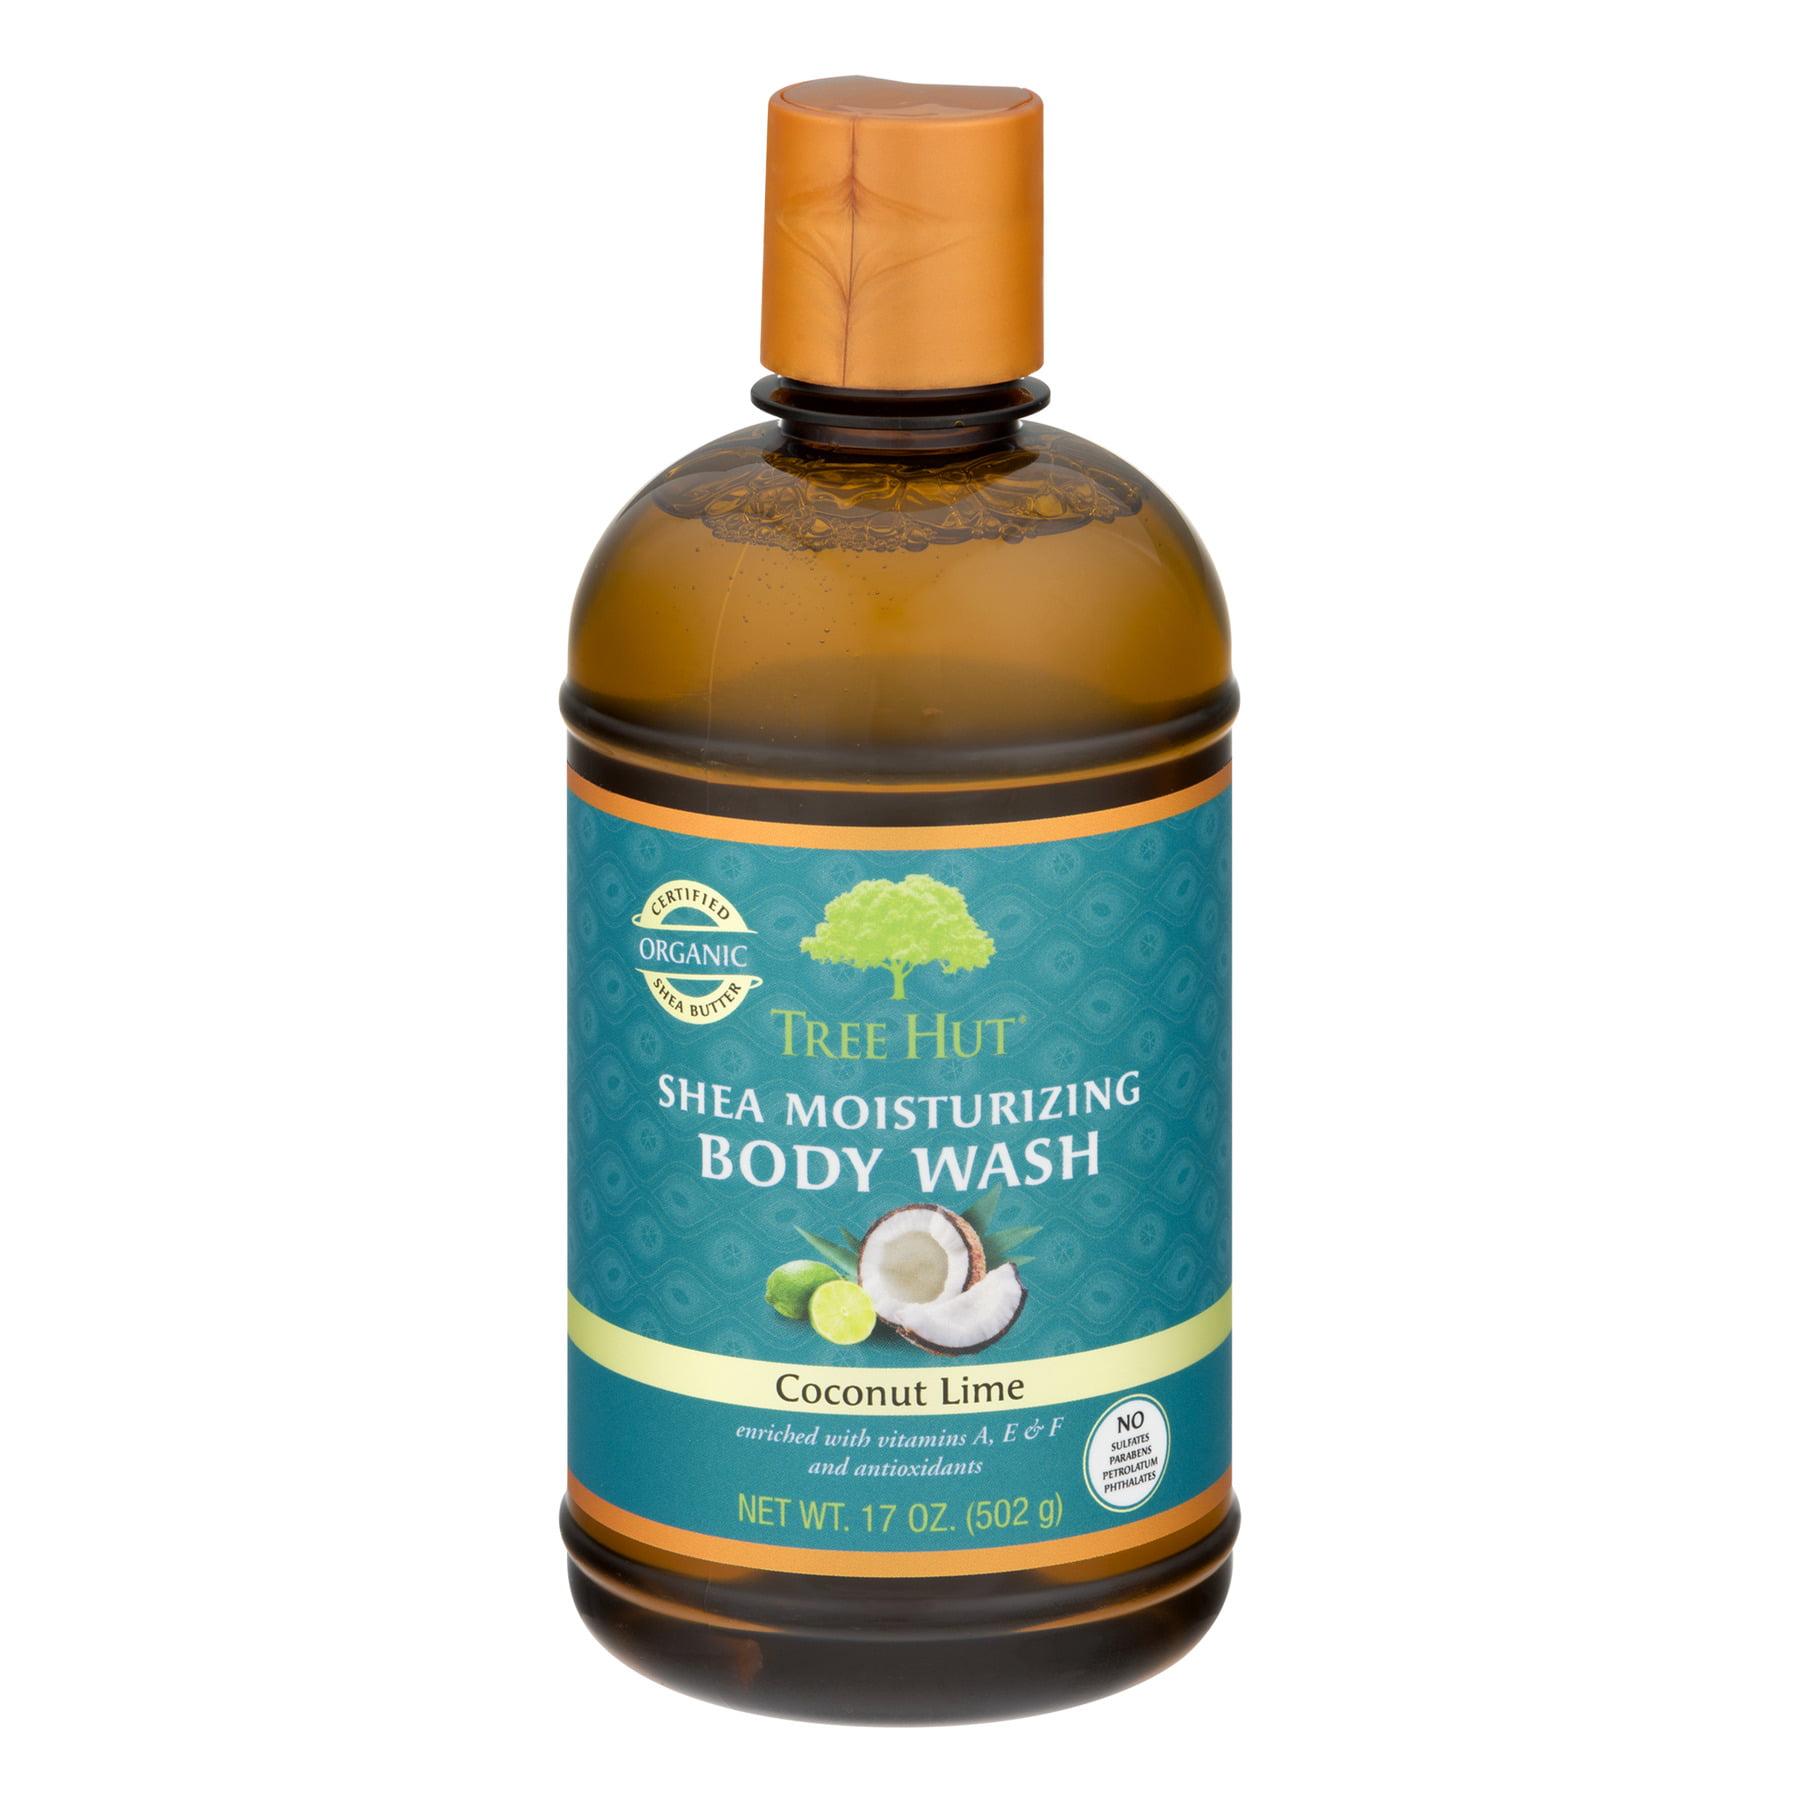 Tree Hut Coconut Lime Shea Moisturizing Body Wash, 17 oz